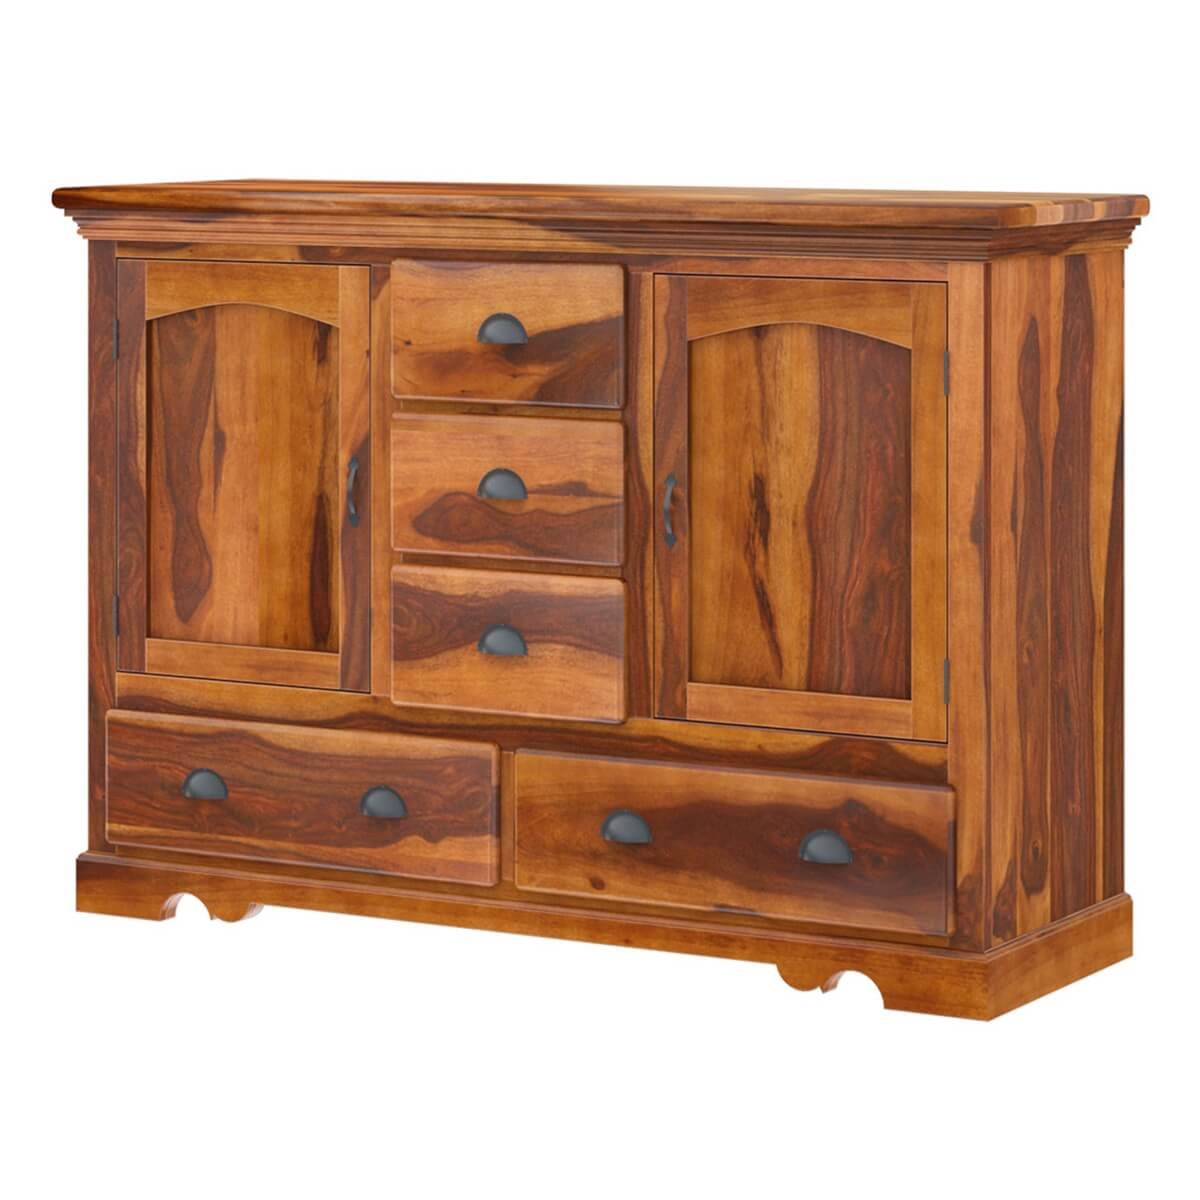 Reclaimed wood buffet sideboard distressed